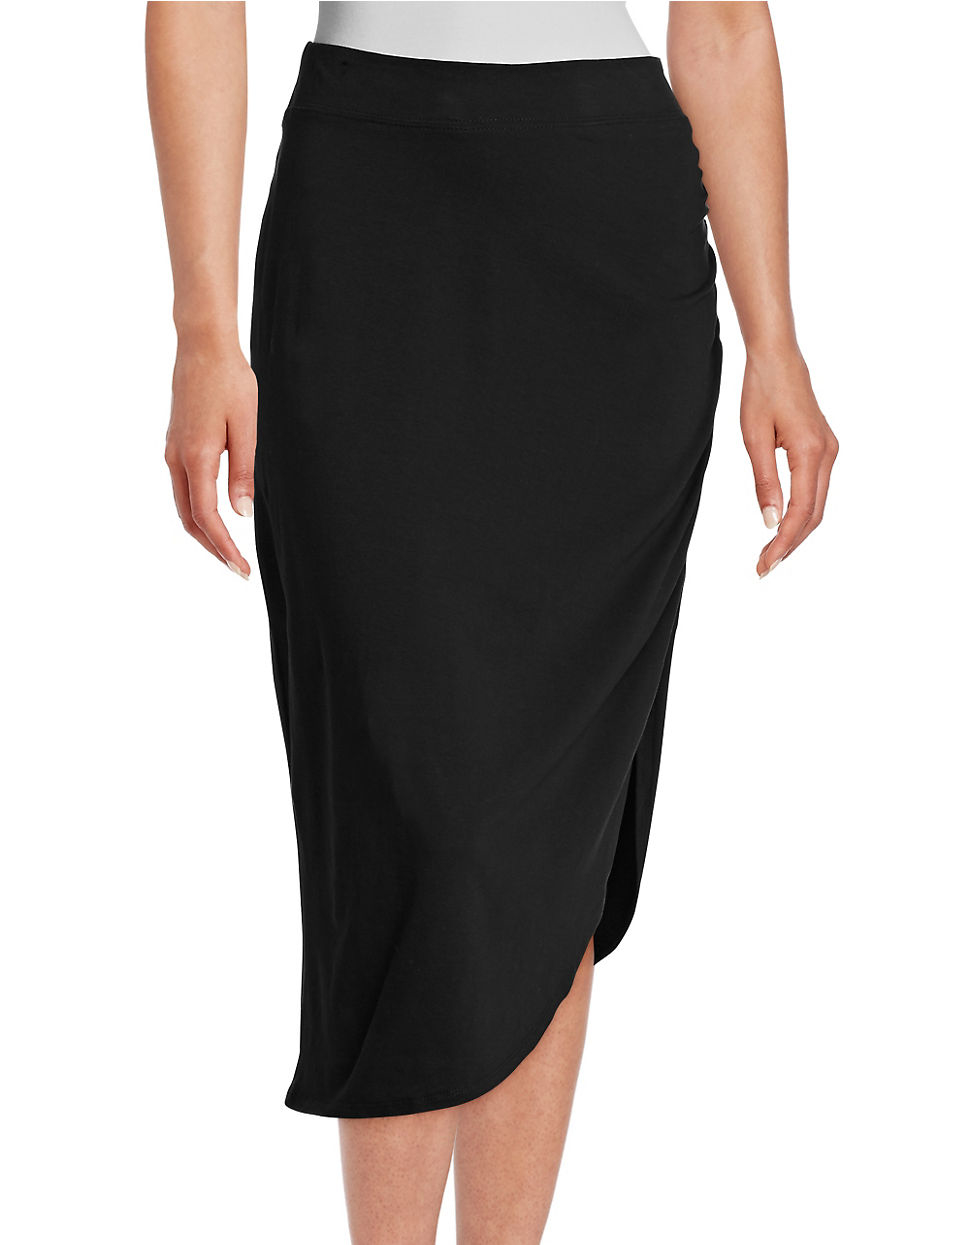 kensie heathered asymmetrically draped pencil skirt in